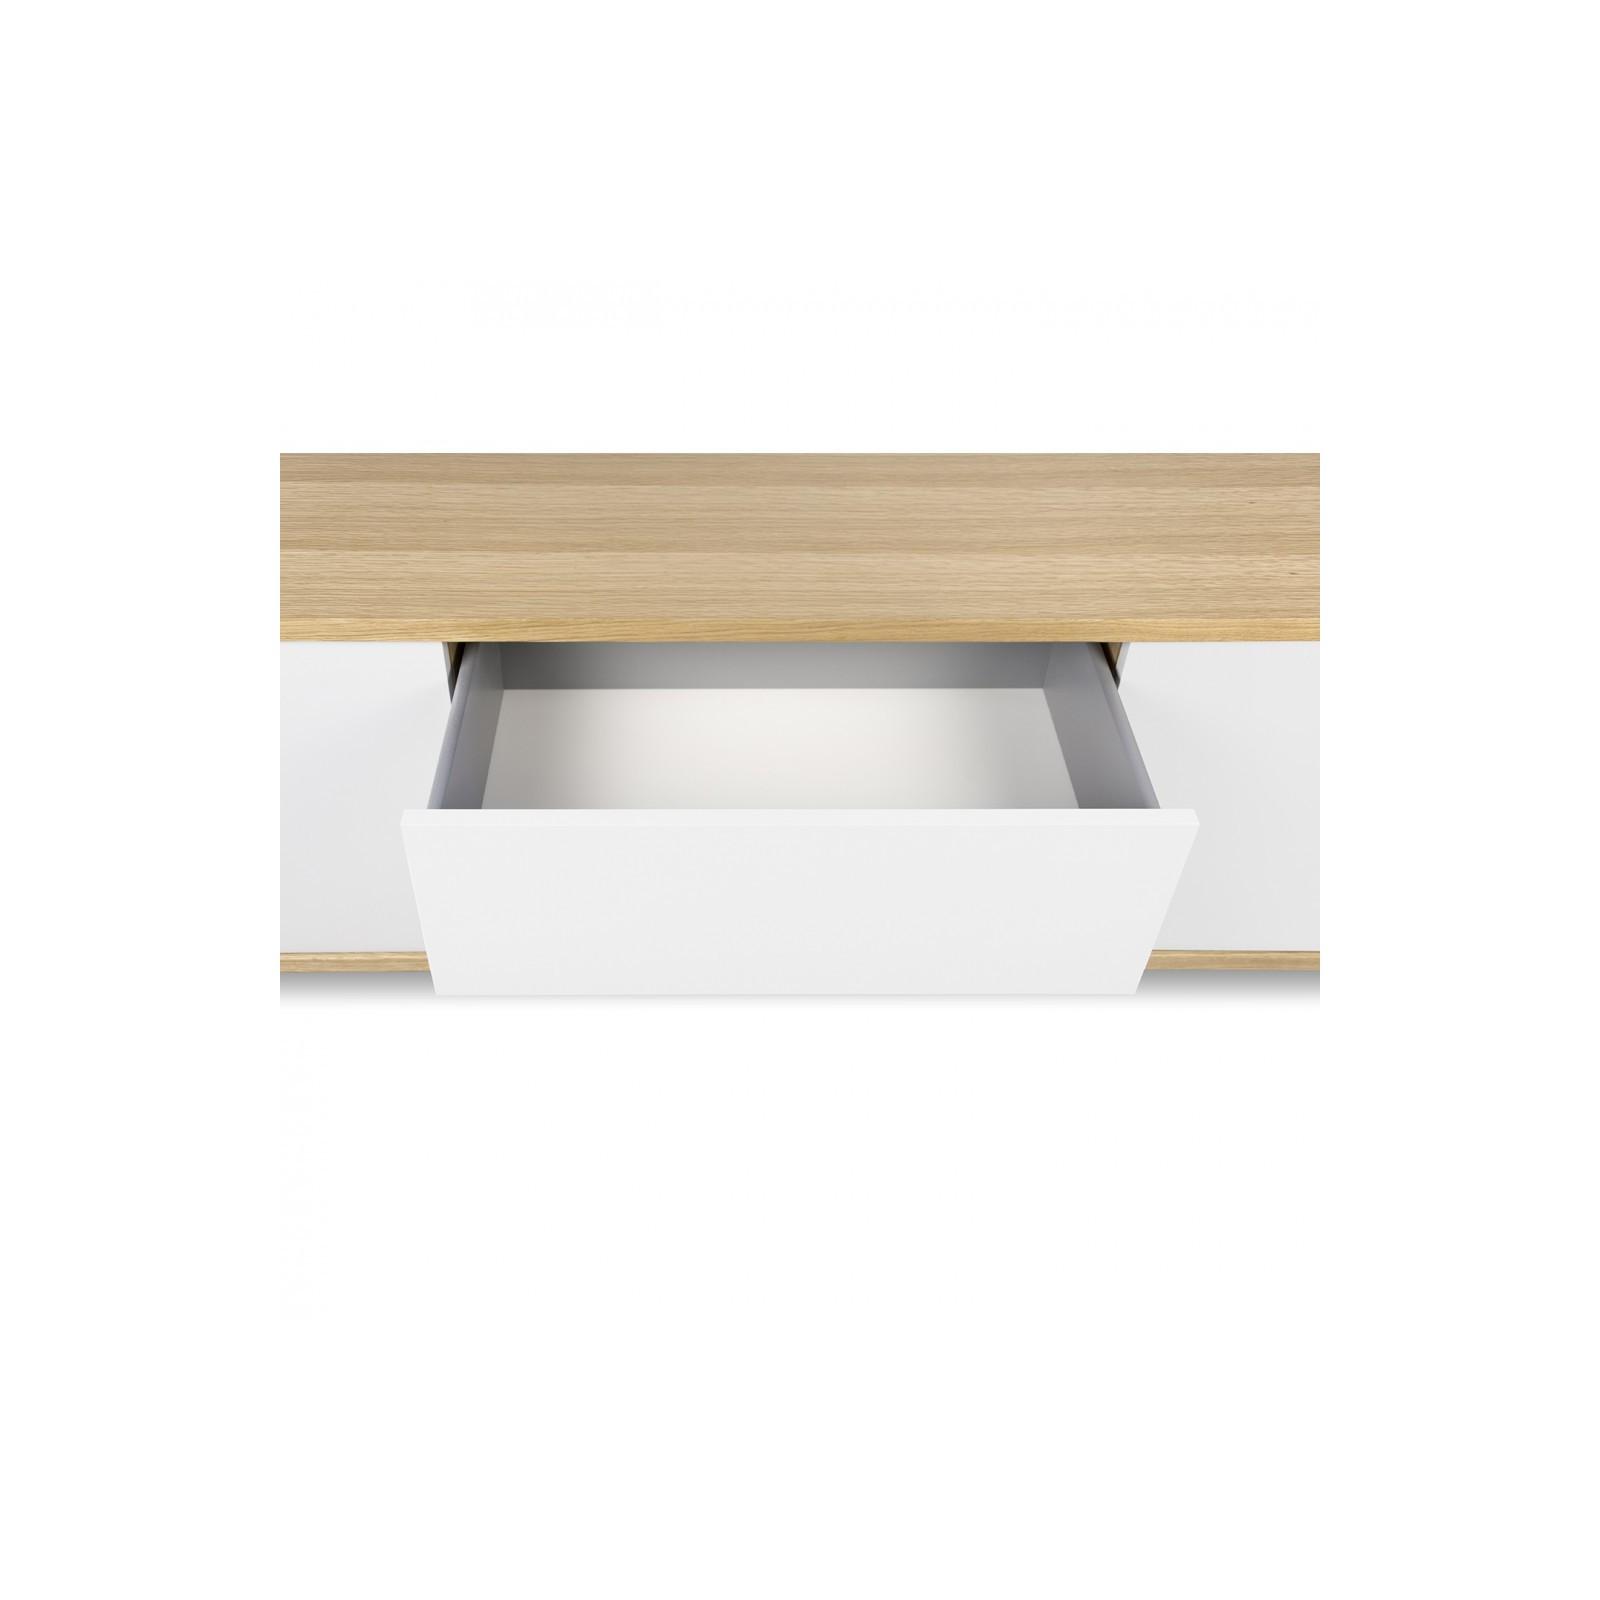 meuble tv danois blanc et bois arne concept. Black Bedroom Furniture Sets. Home Design Ideas